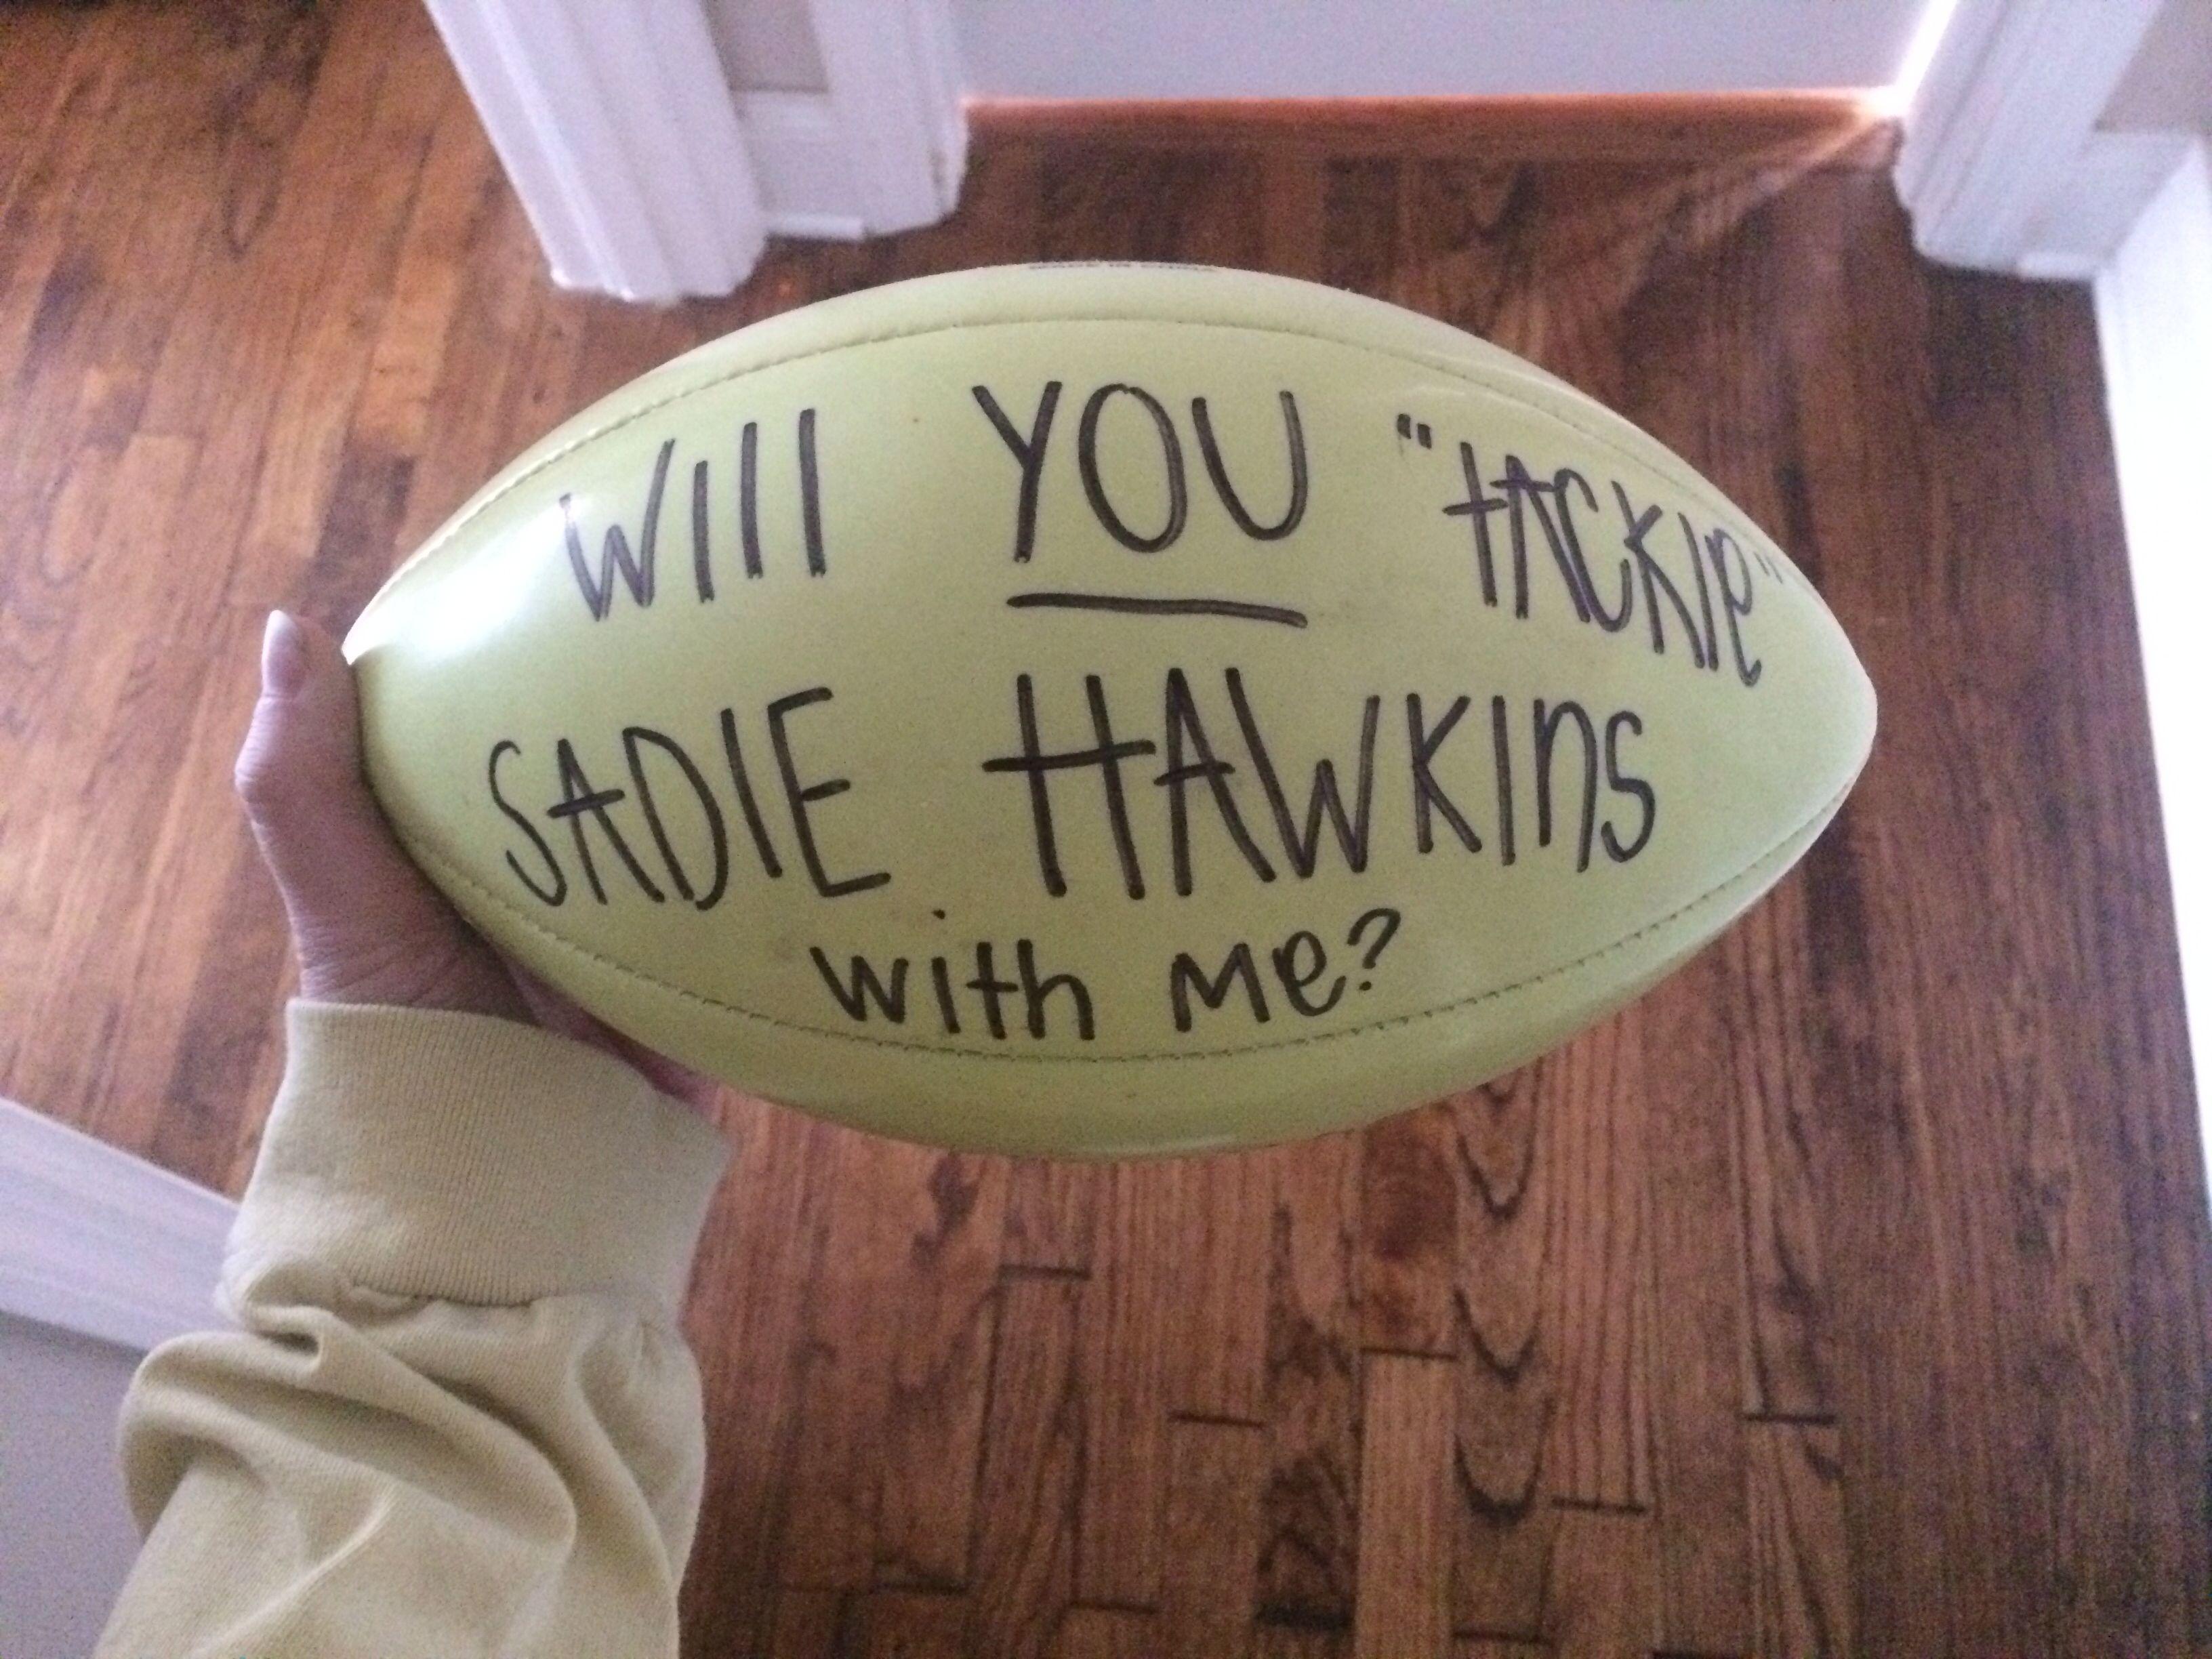 Ways to ask a football player to sadies